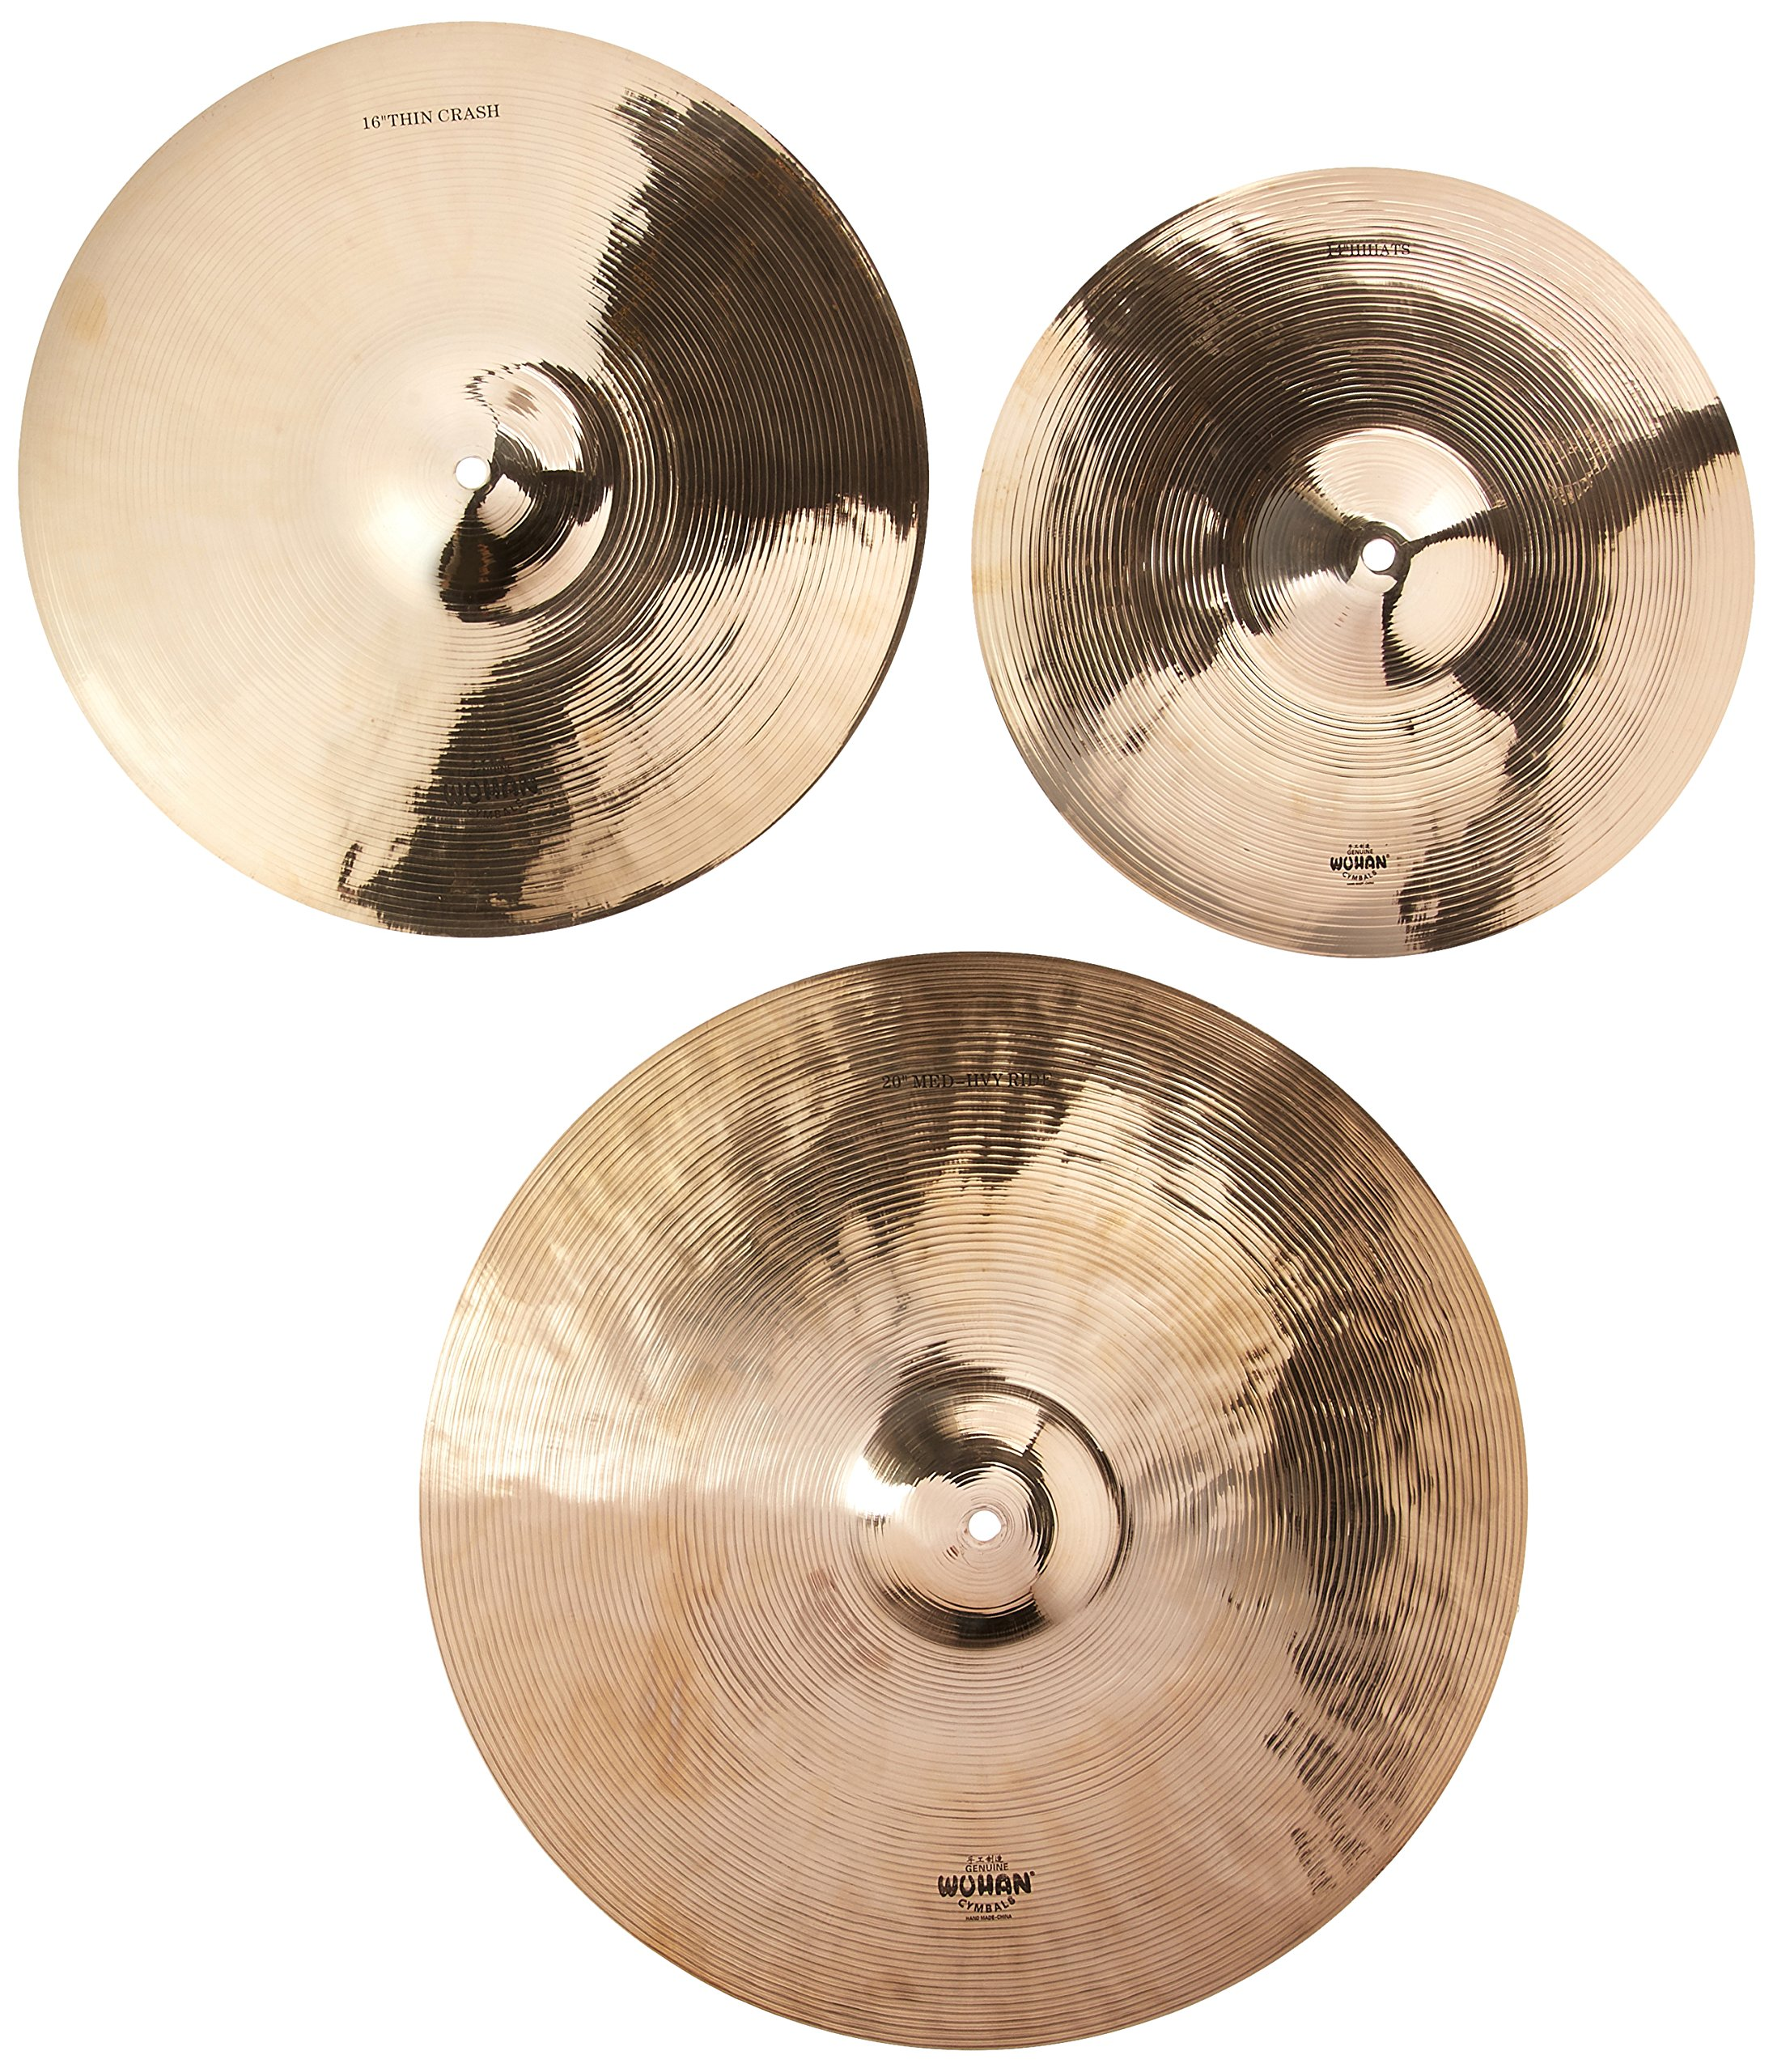 Wuhan WUTBSU Western Style Cymbal Set with Cymbal Bag by WUHAN